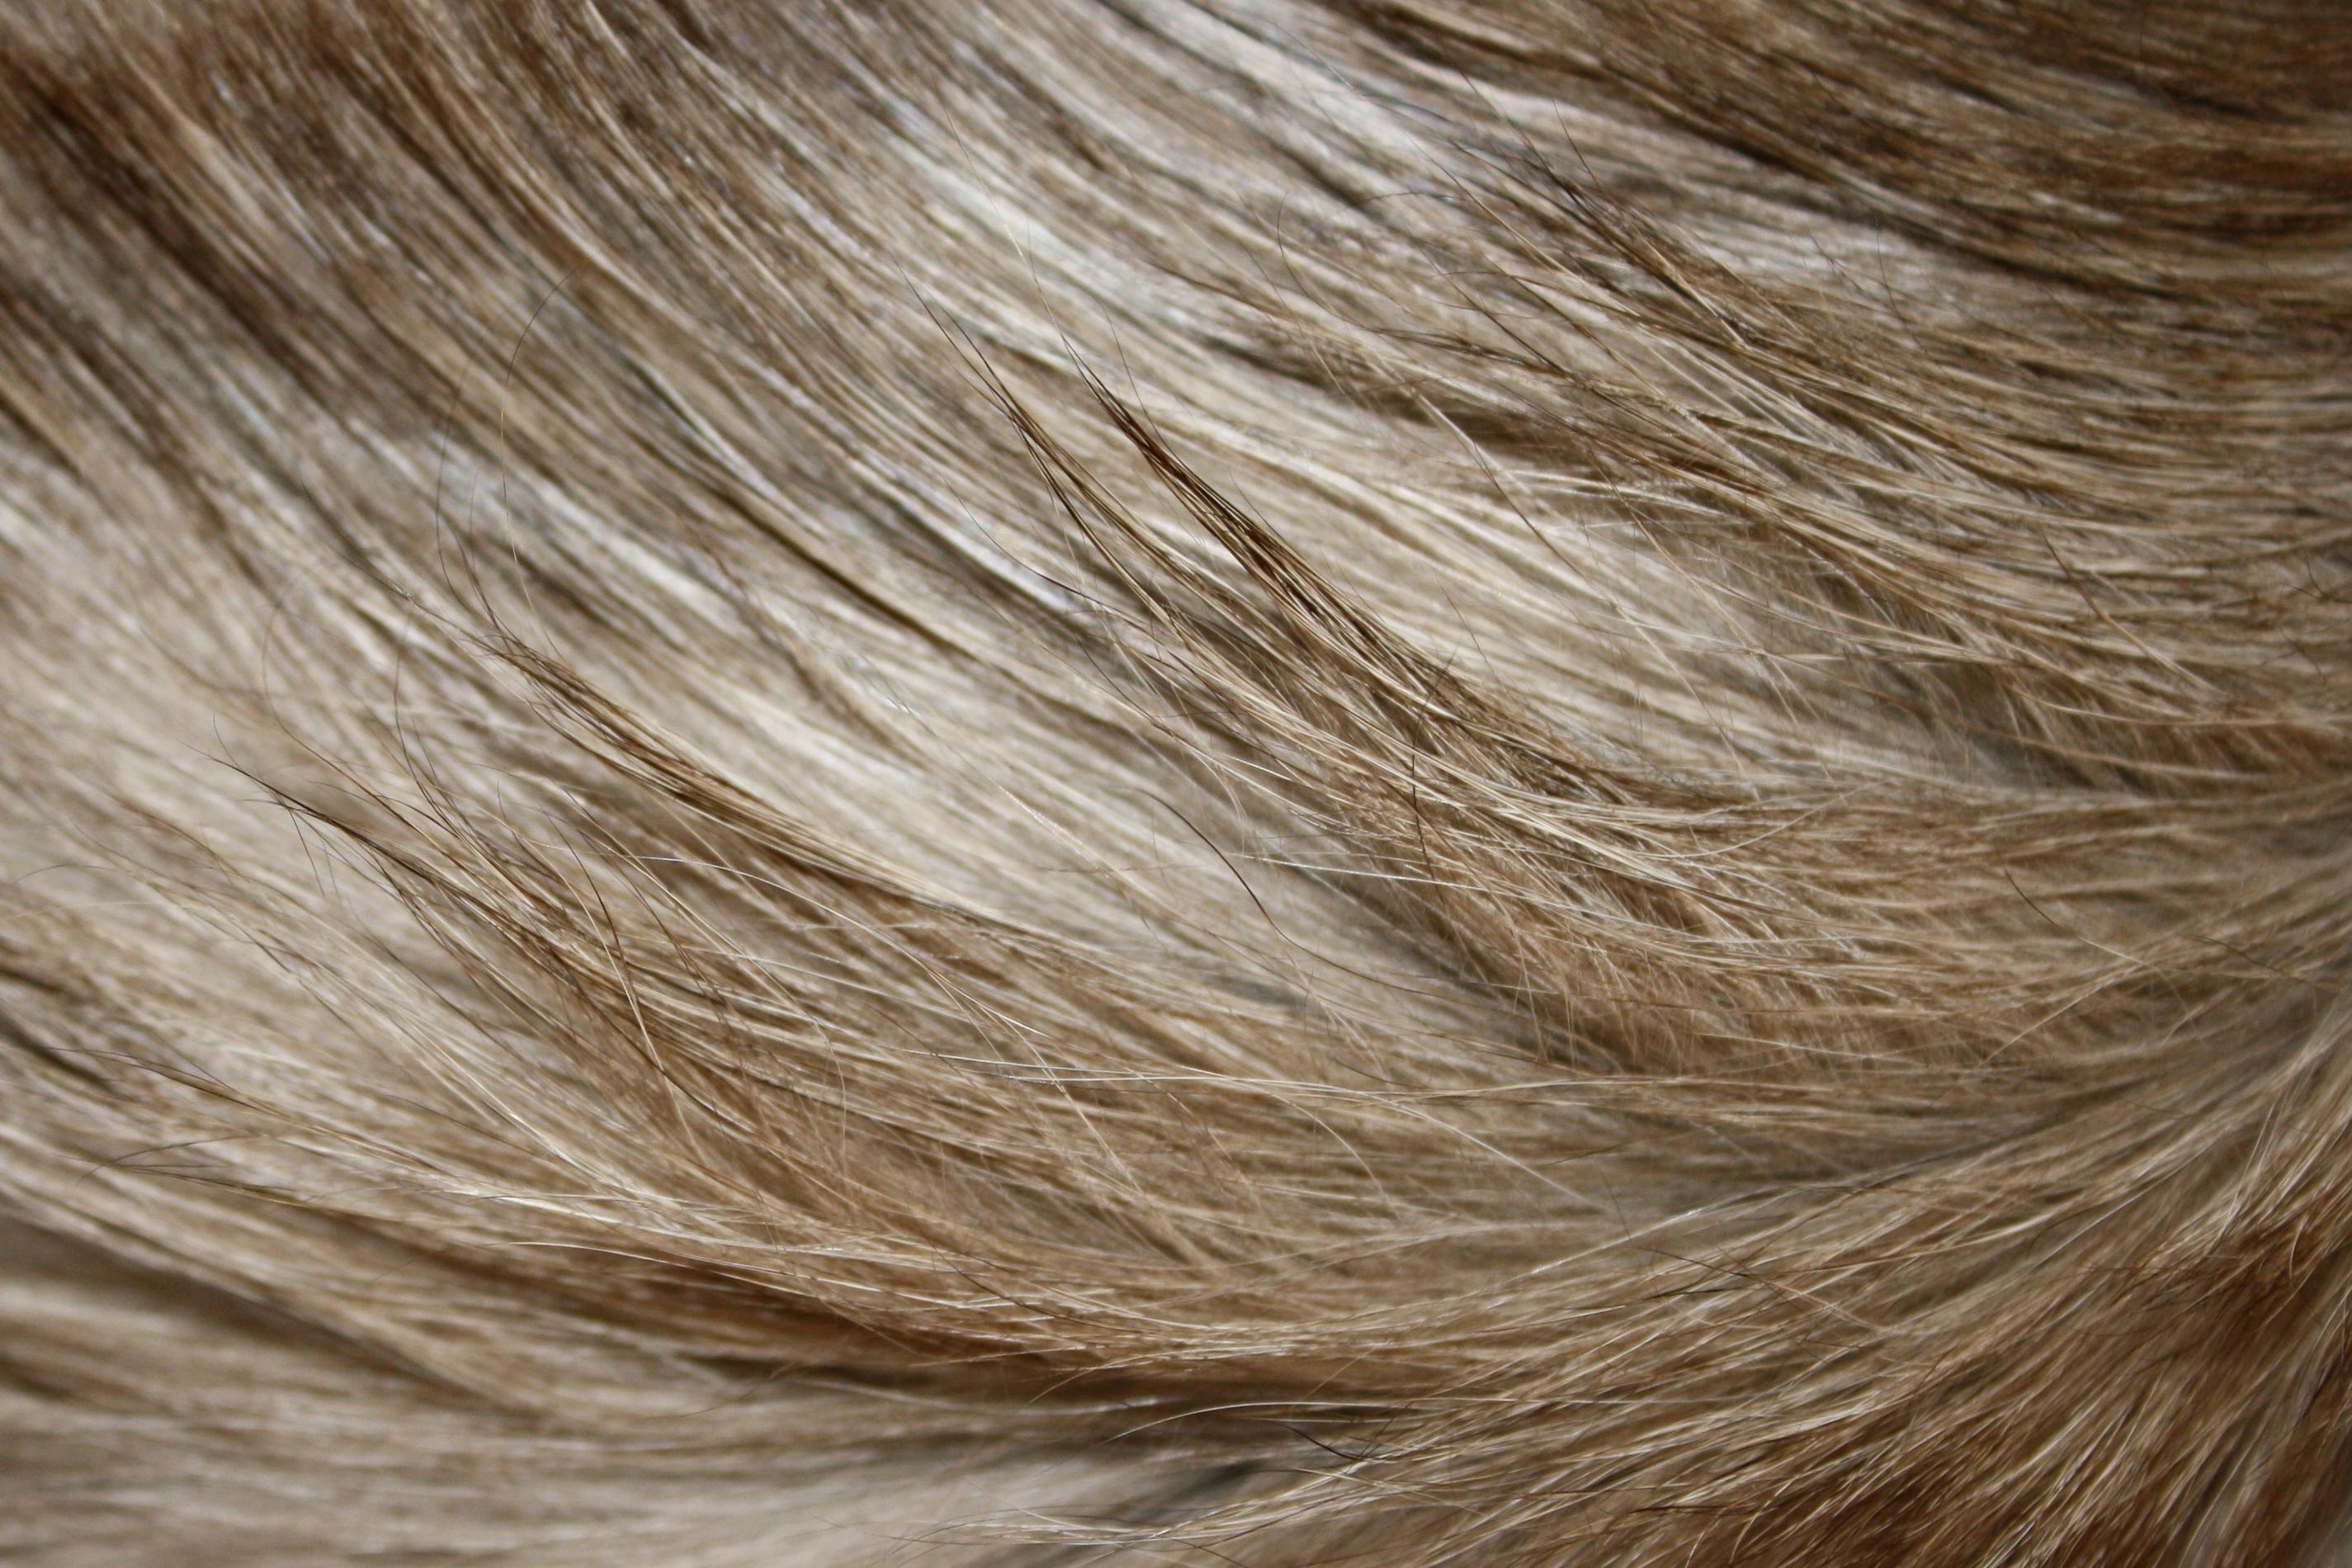 Free picture long hair blonde hair fur texture